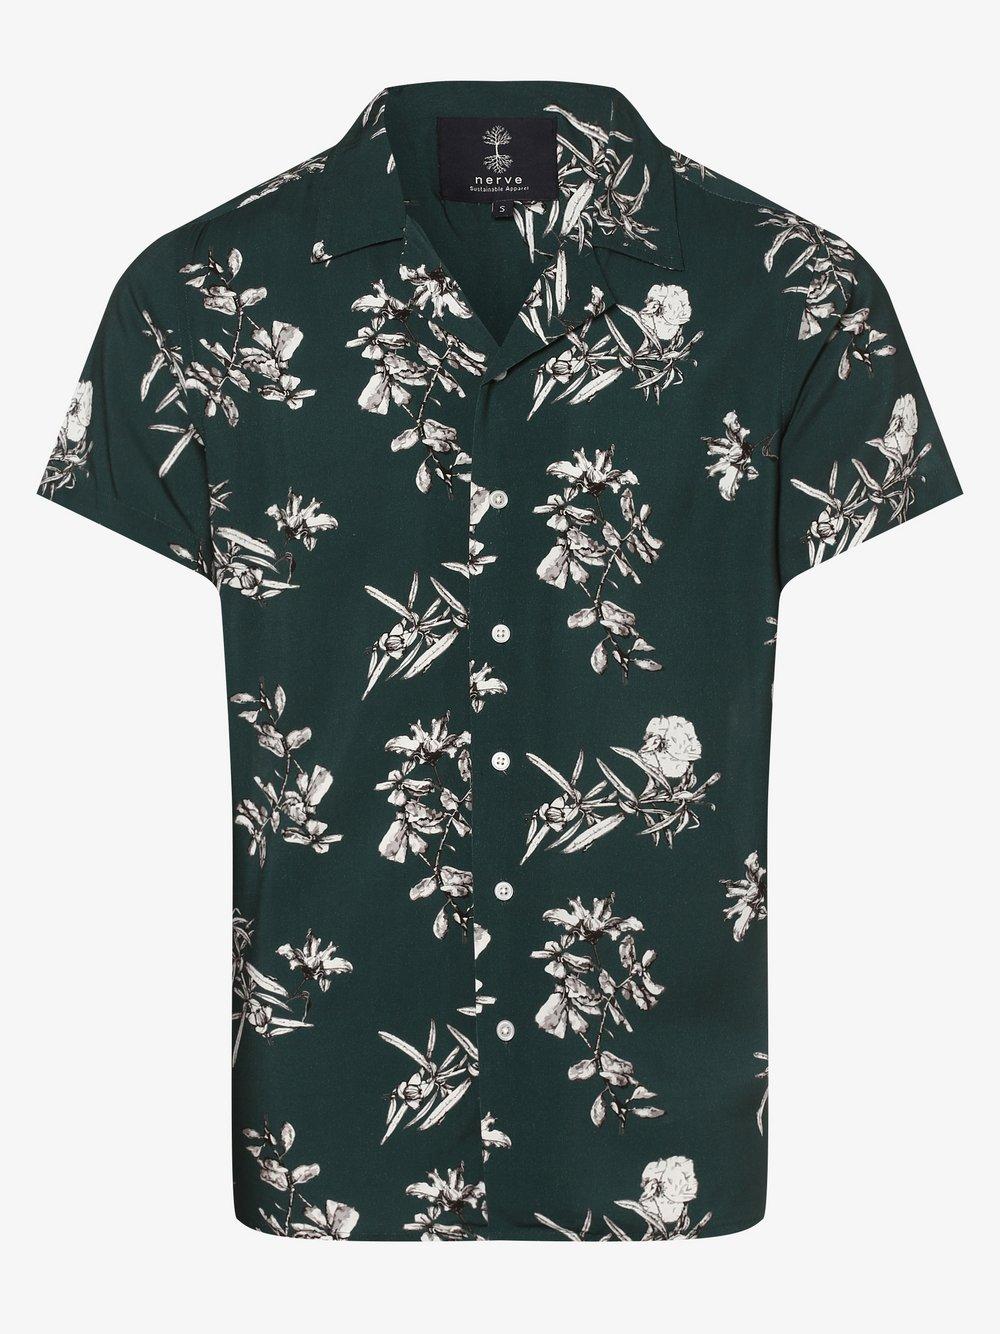 nerve – Koszula męska – NESerge, różowy Van Graaf 477820-0001-09970